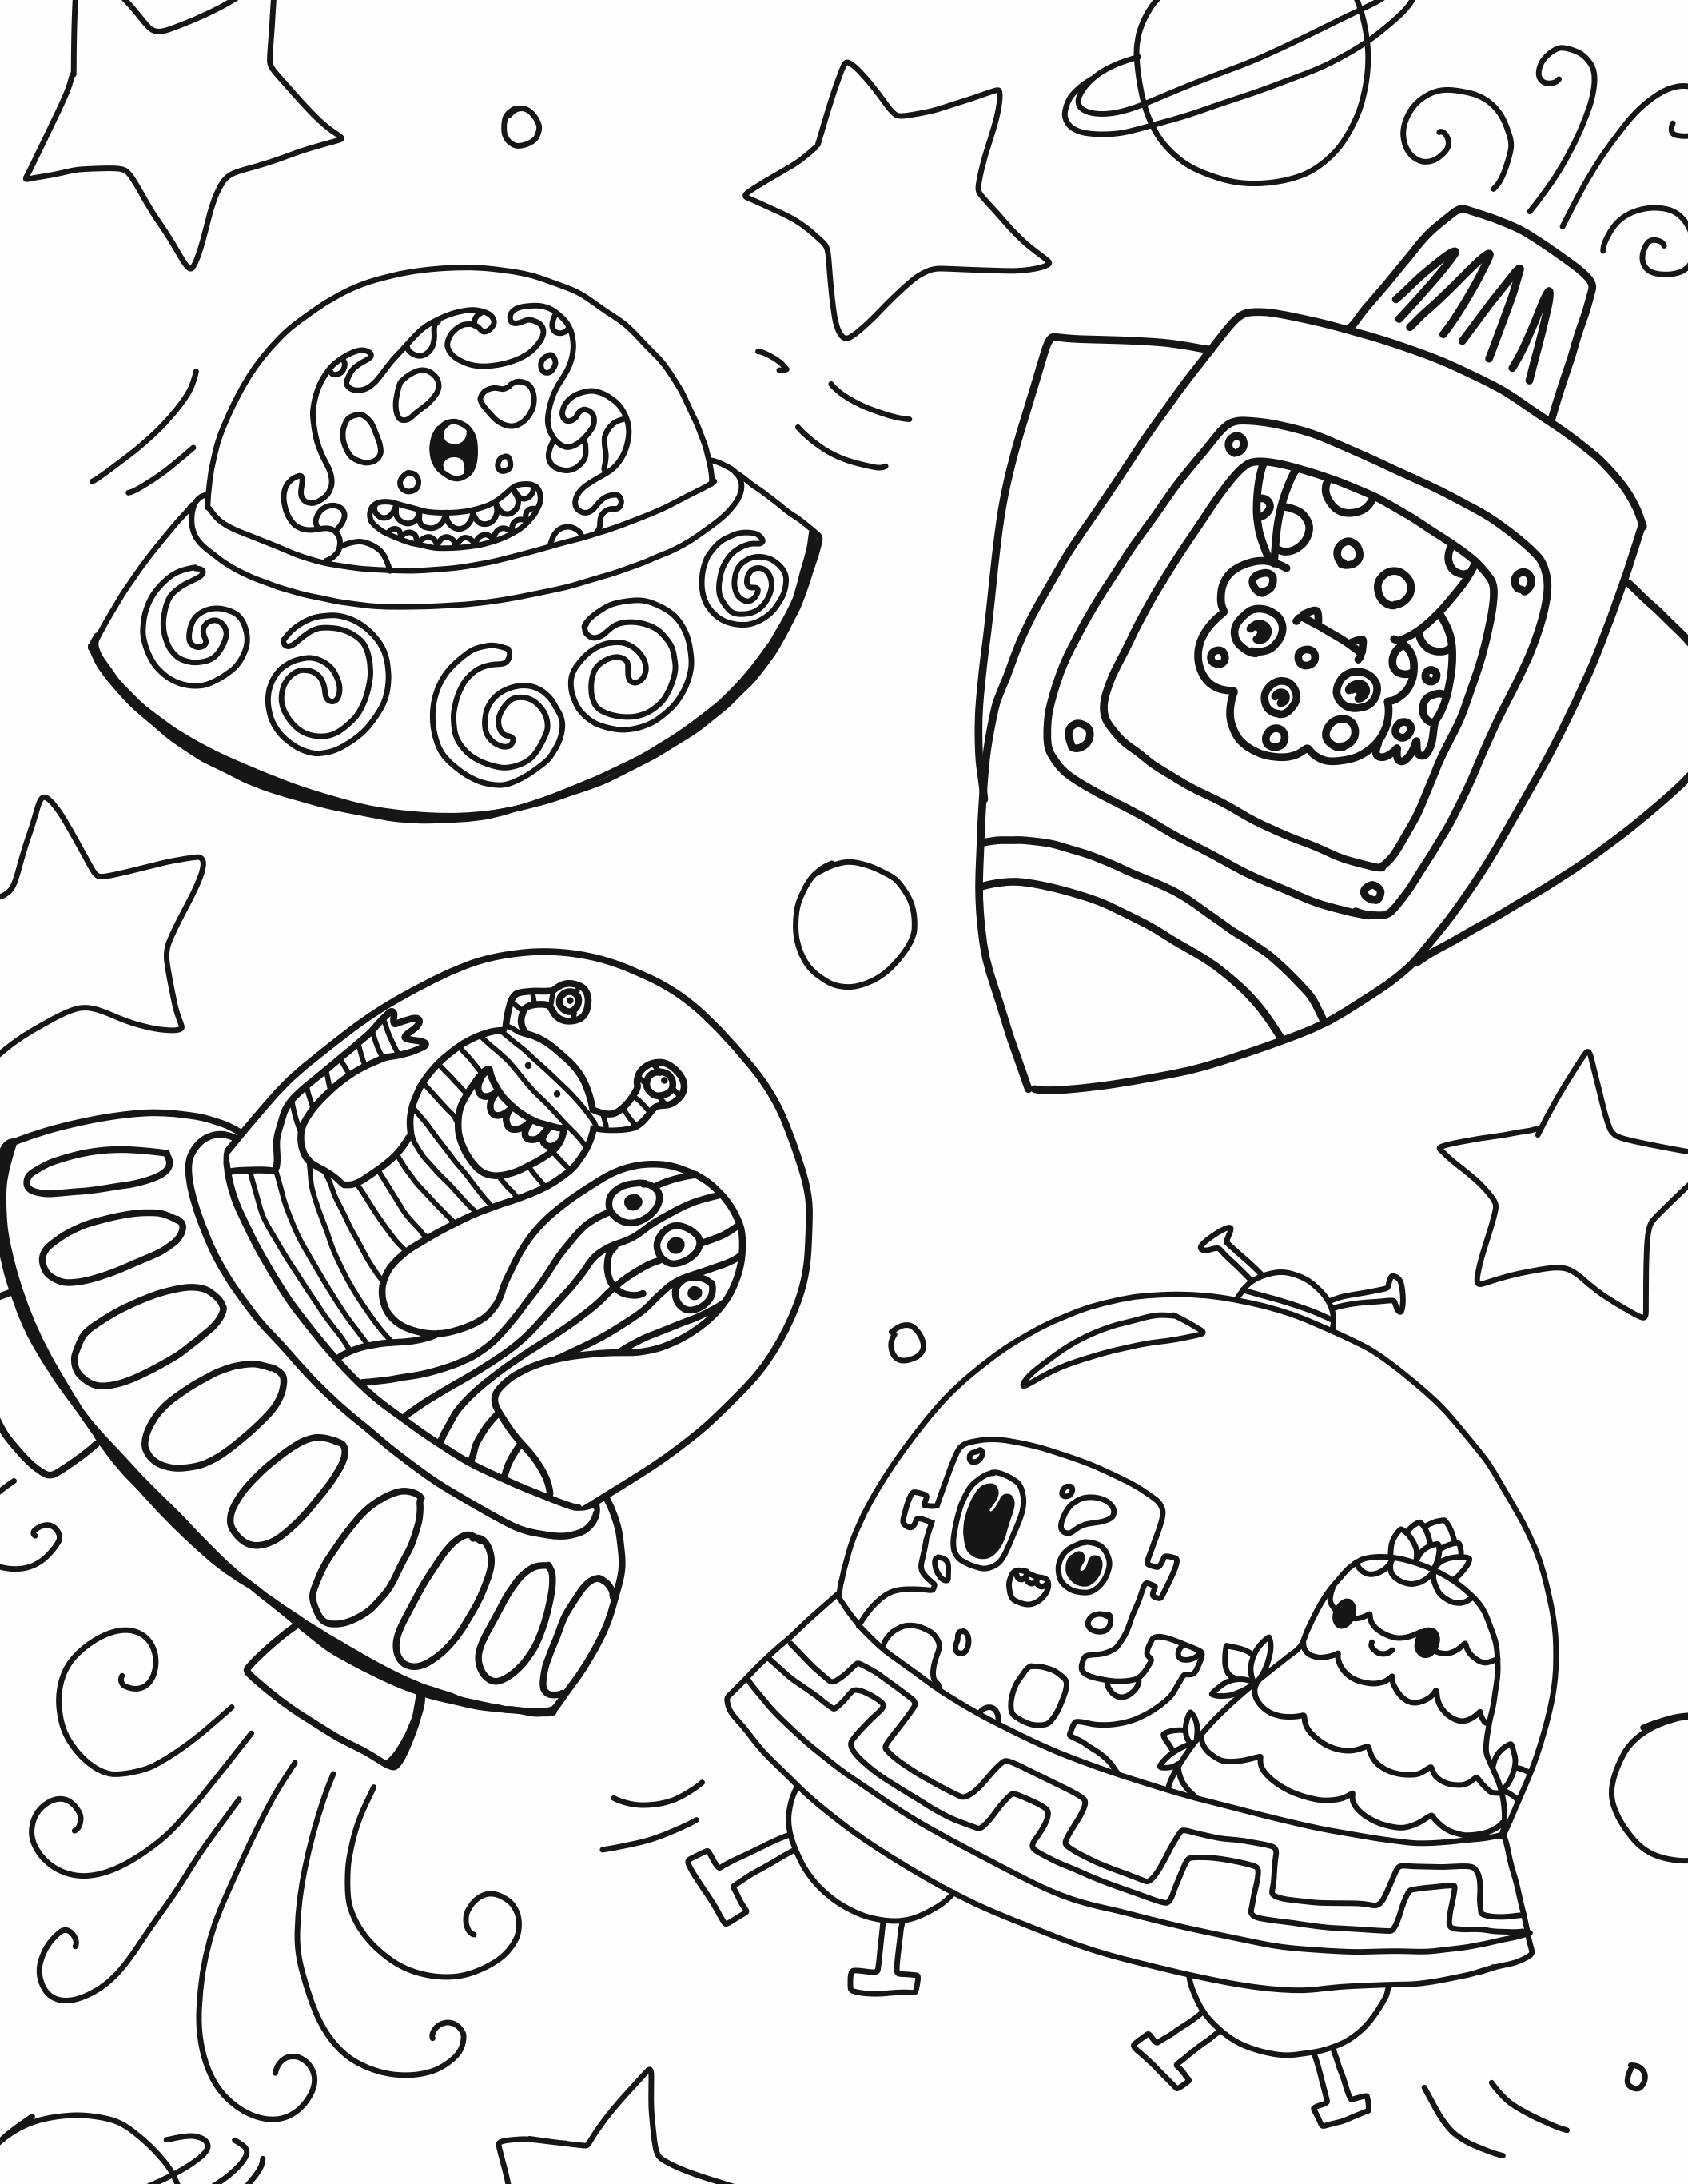 2017 june kids coloring contest winner